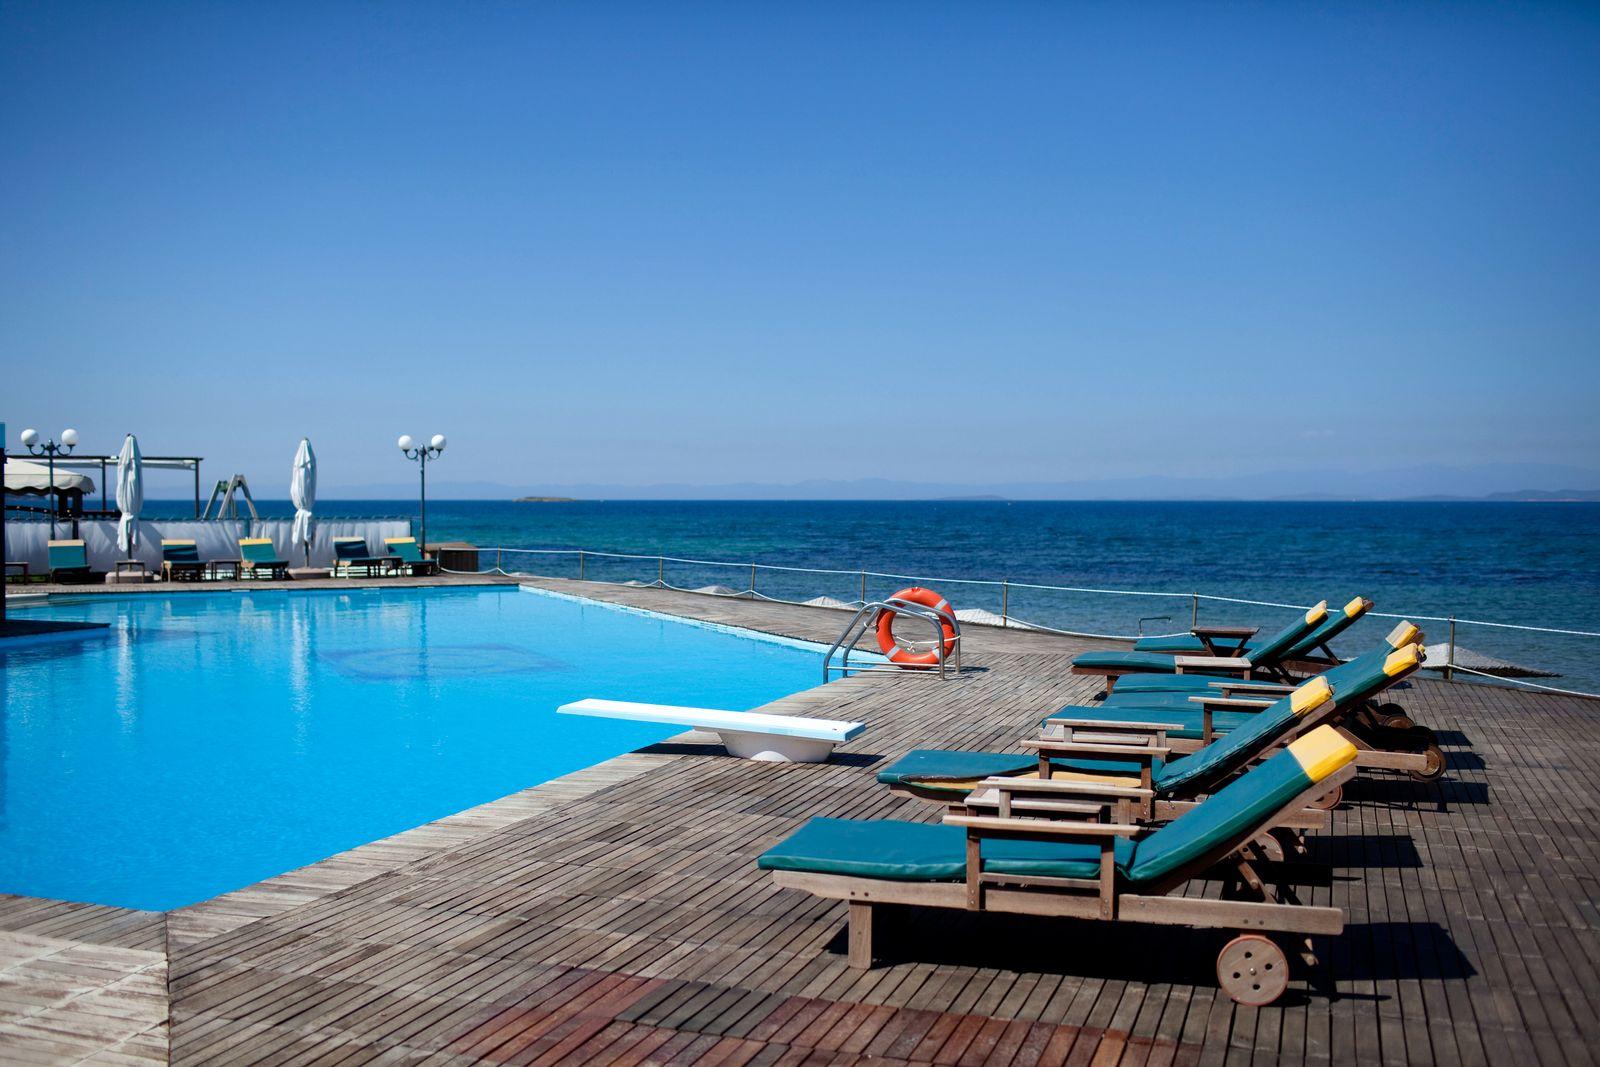 Griechenland / Pool / Luxus